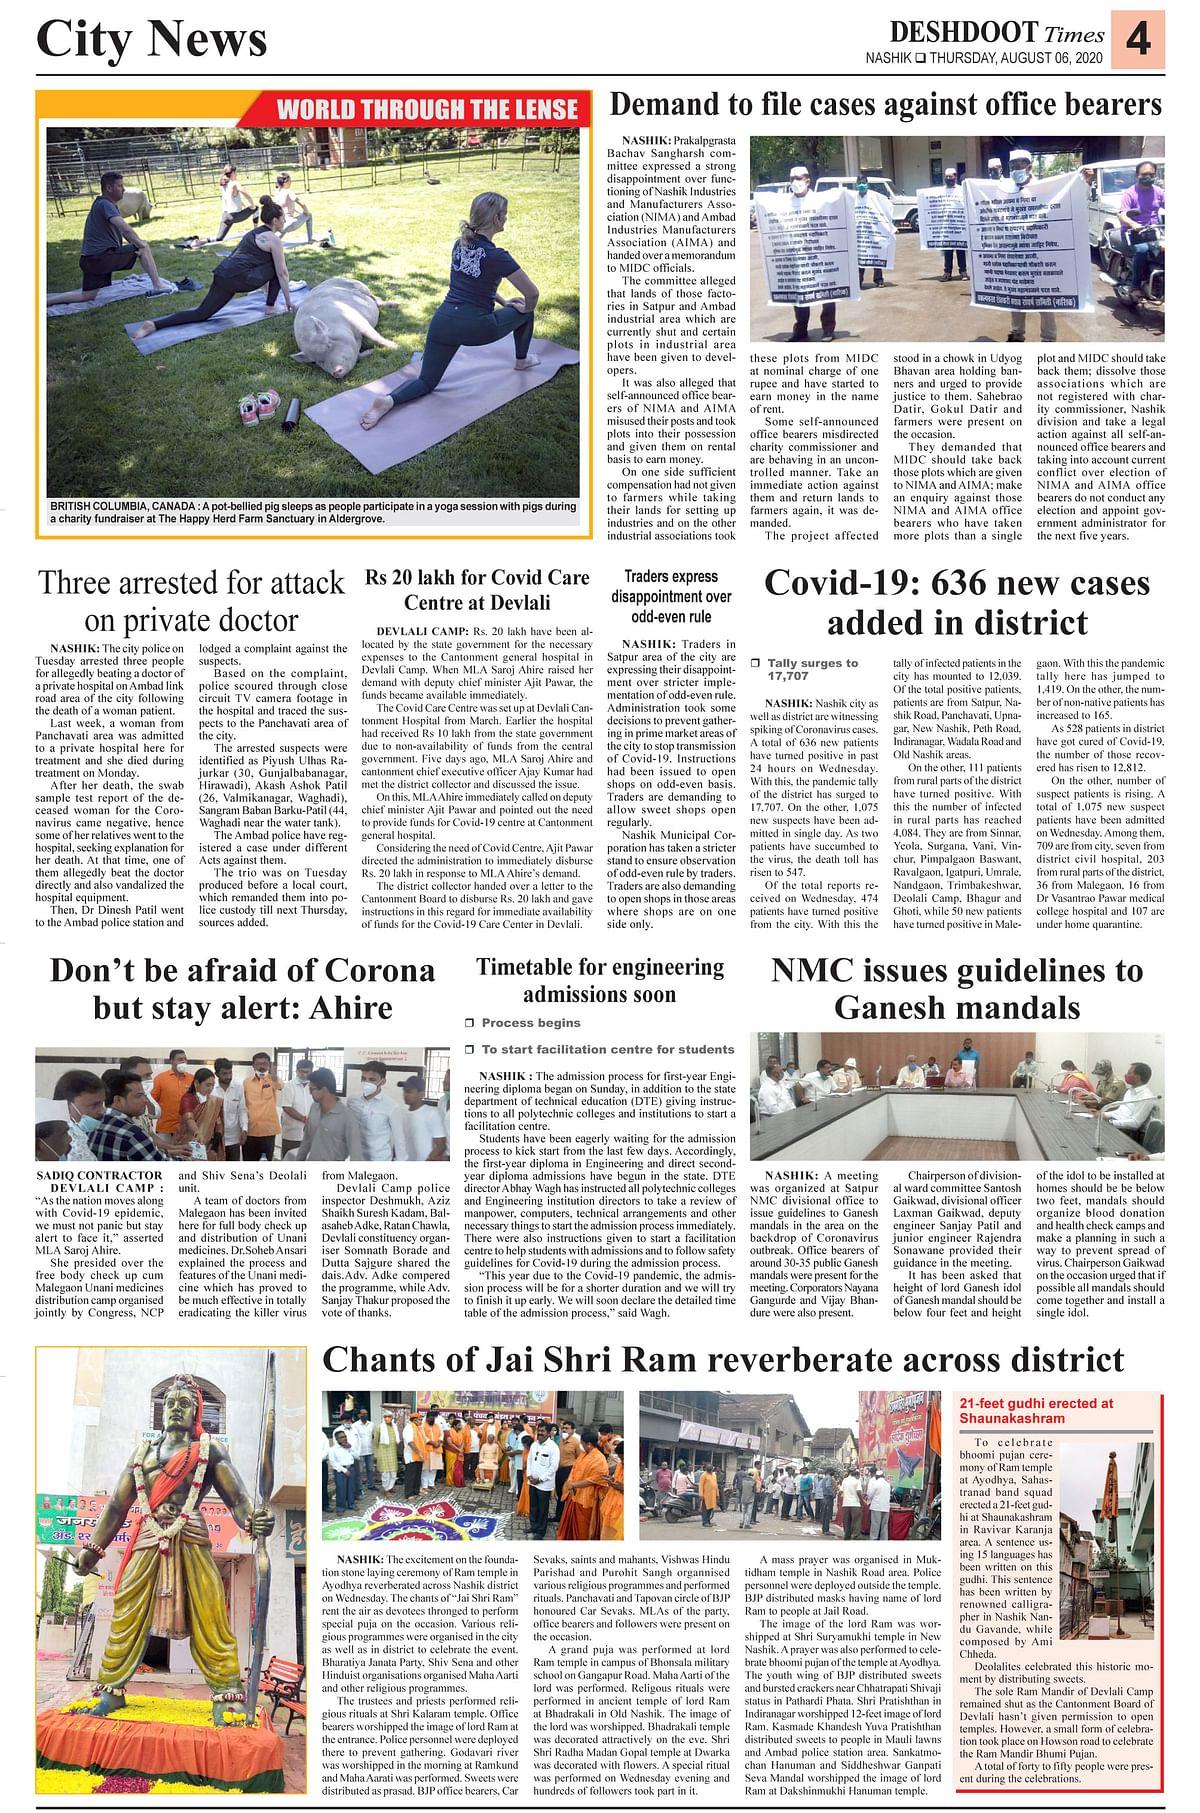 Deshdoot Times E Paper, 6 August 2020